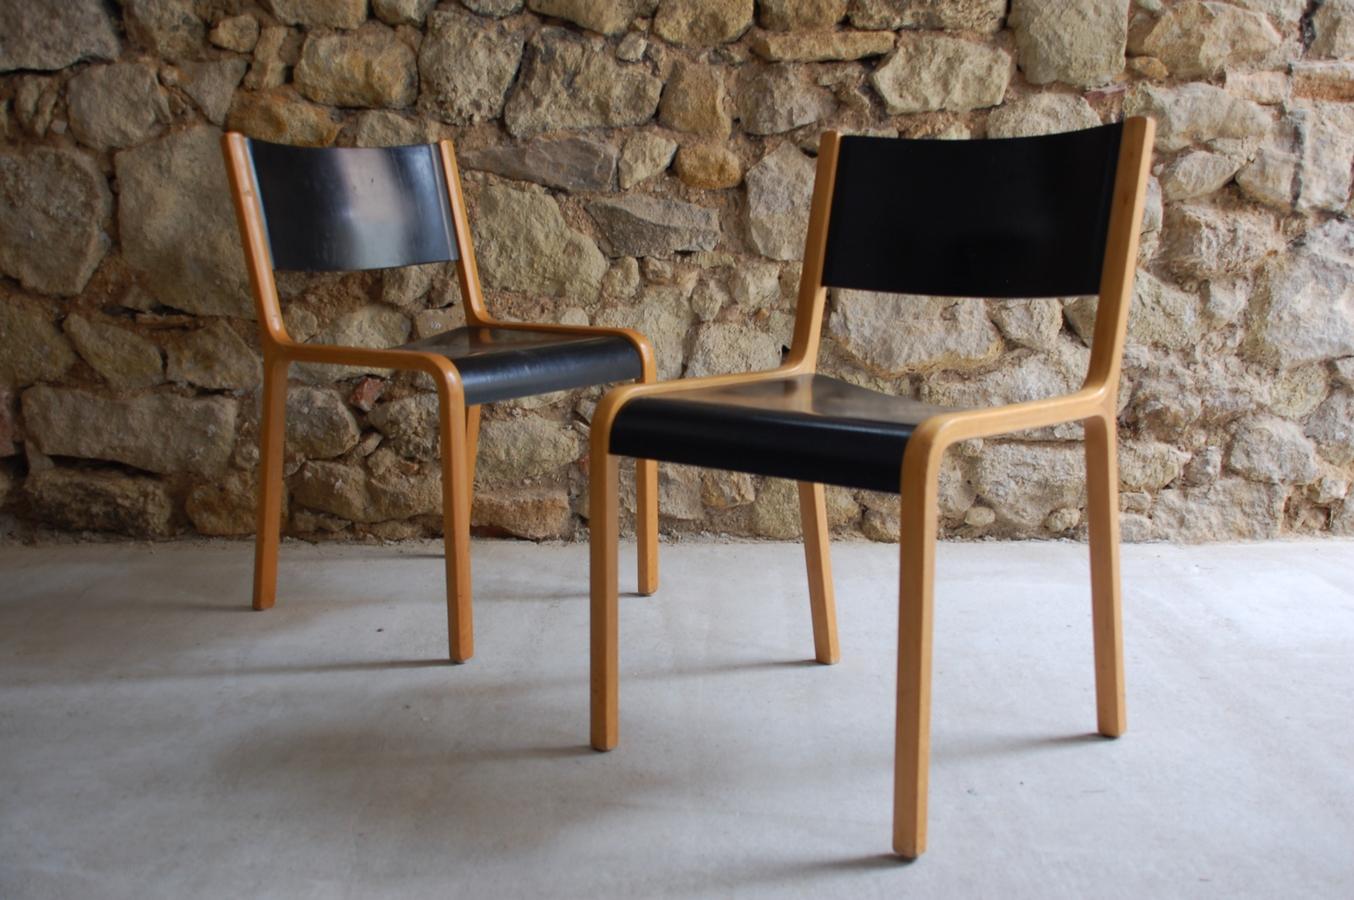 alte vintage holzst hle im mid century stil von wilkhahn 1960 1 v 20 design ikonen. Black Bedroom Furniture Sets. Home Design Ideas